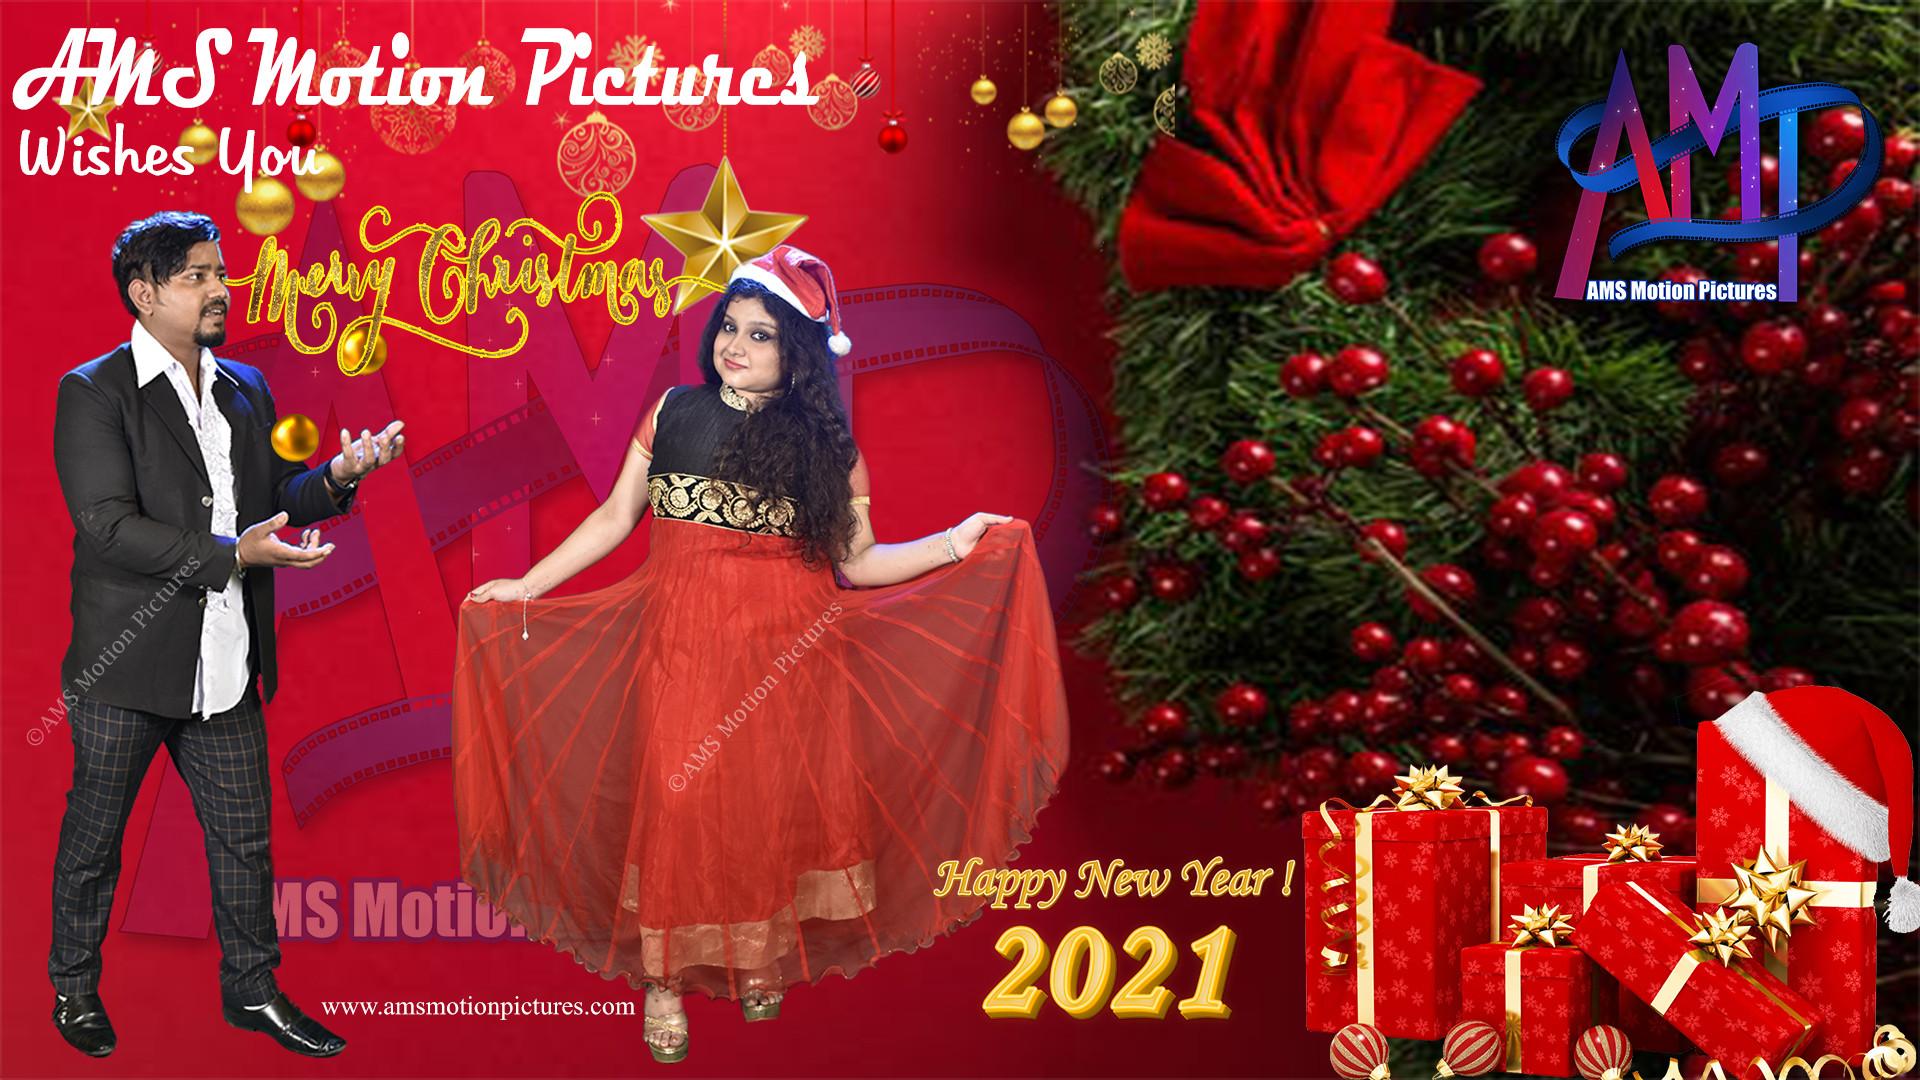 Christmas & New Year Poster 02.jpg